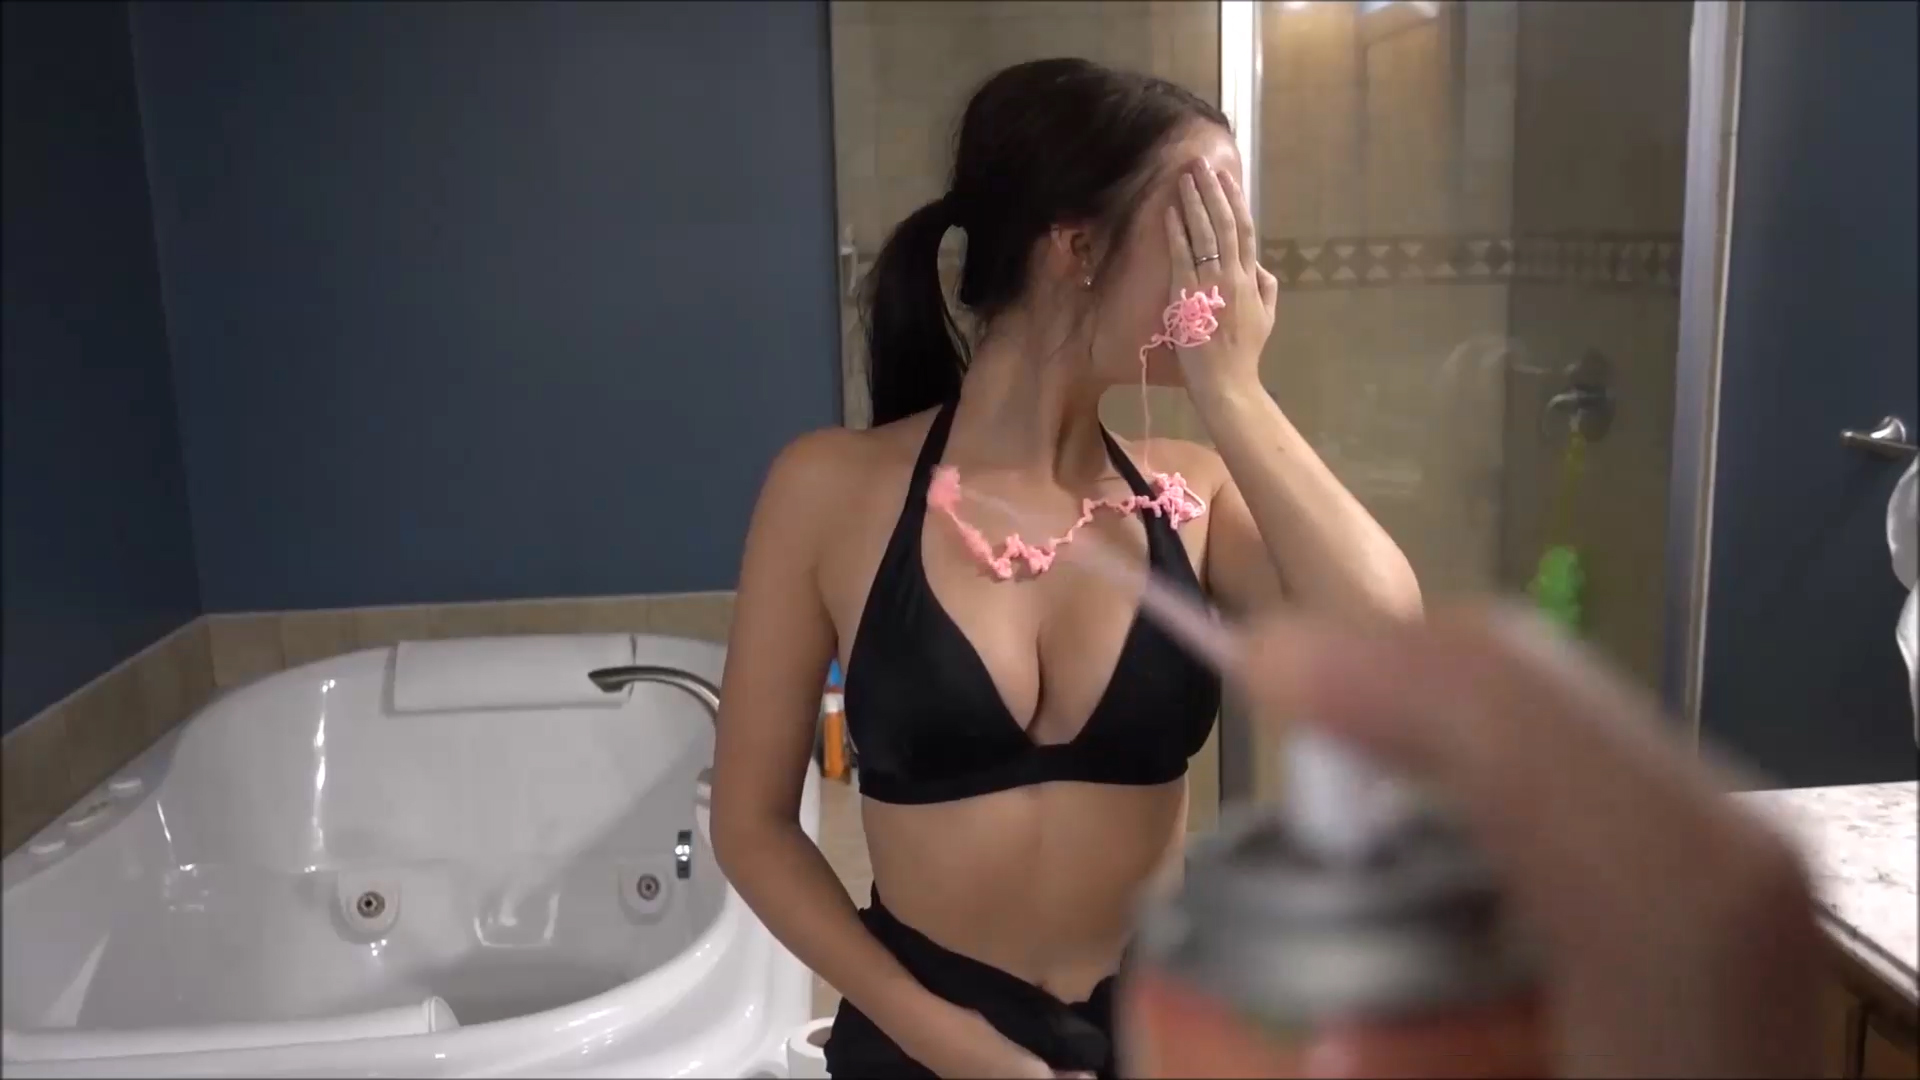 Bathrom porn